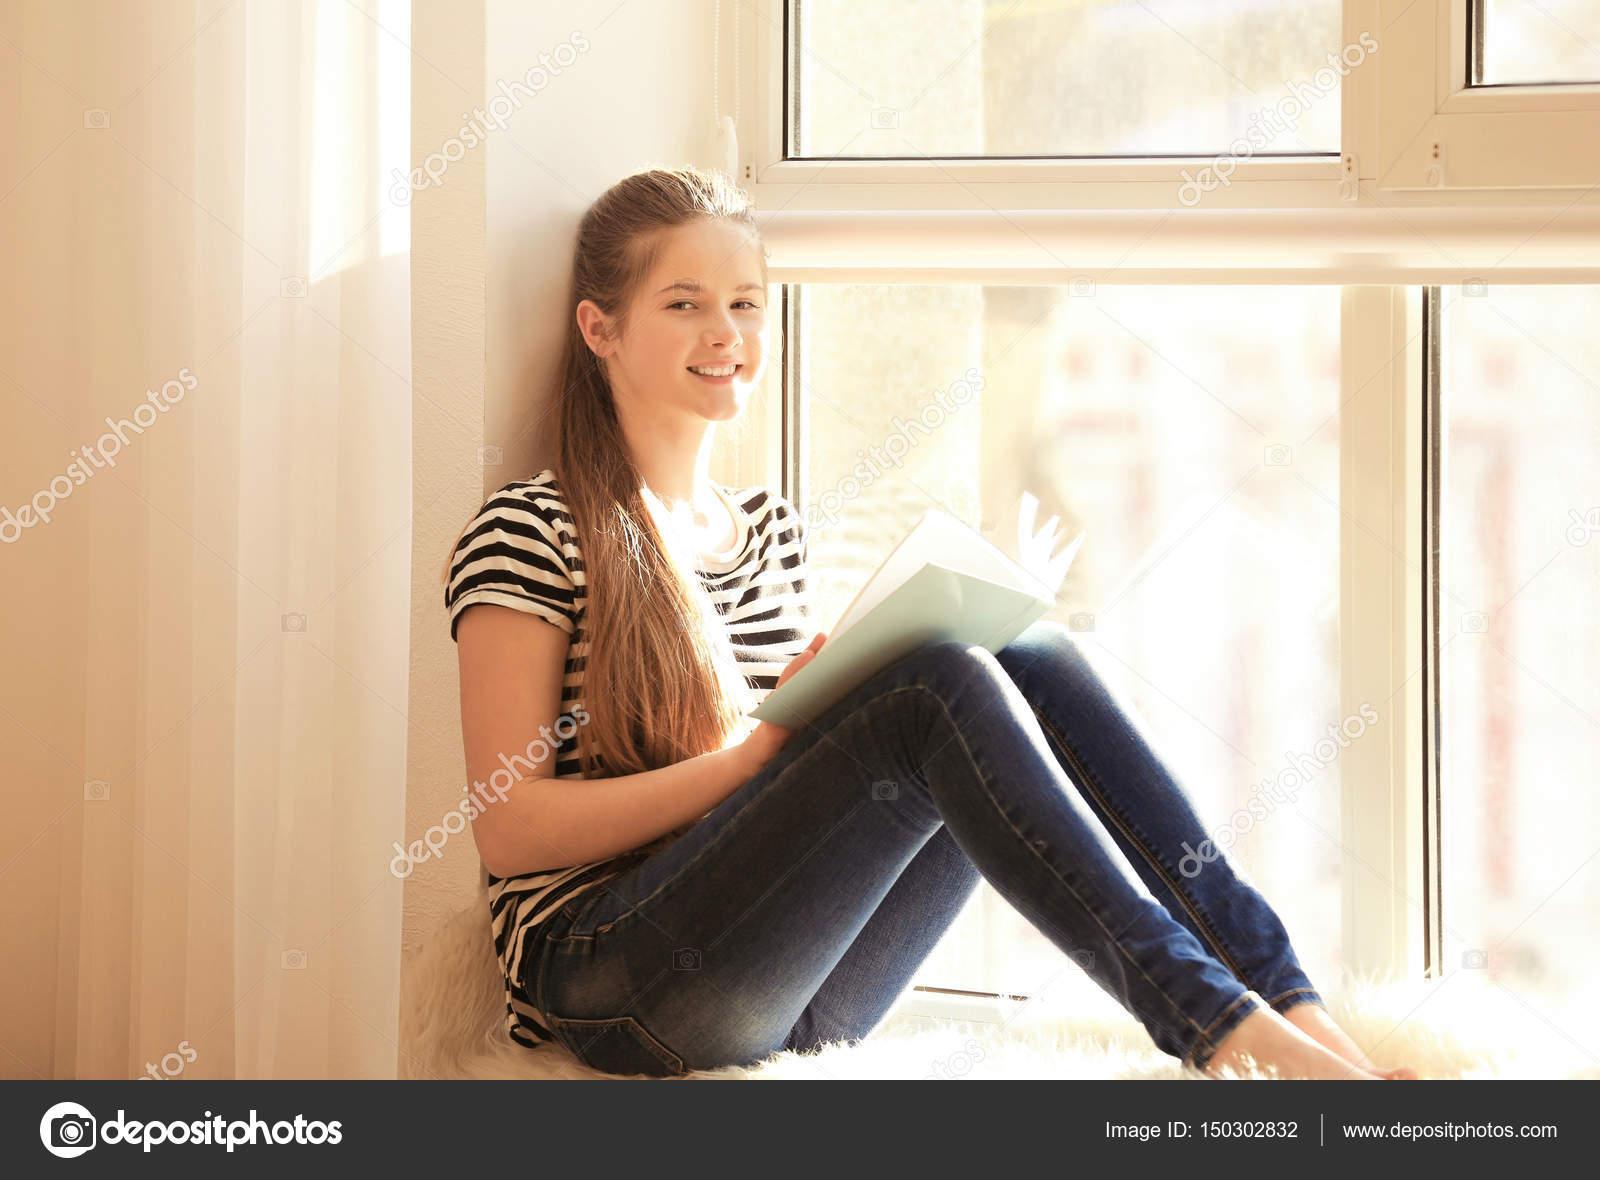 59656bcd5 Livro de leitura do adolescente bonita menina — Fotografias de Stock ...